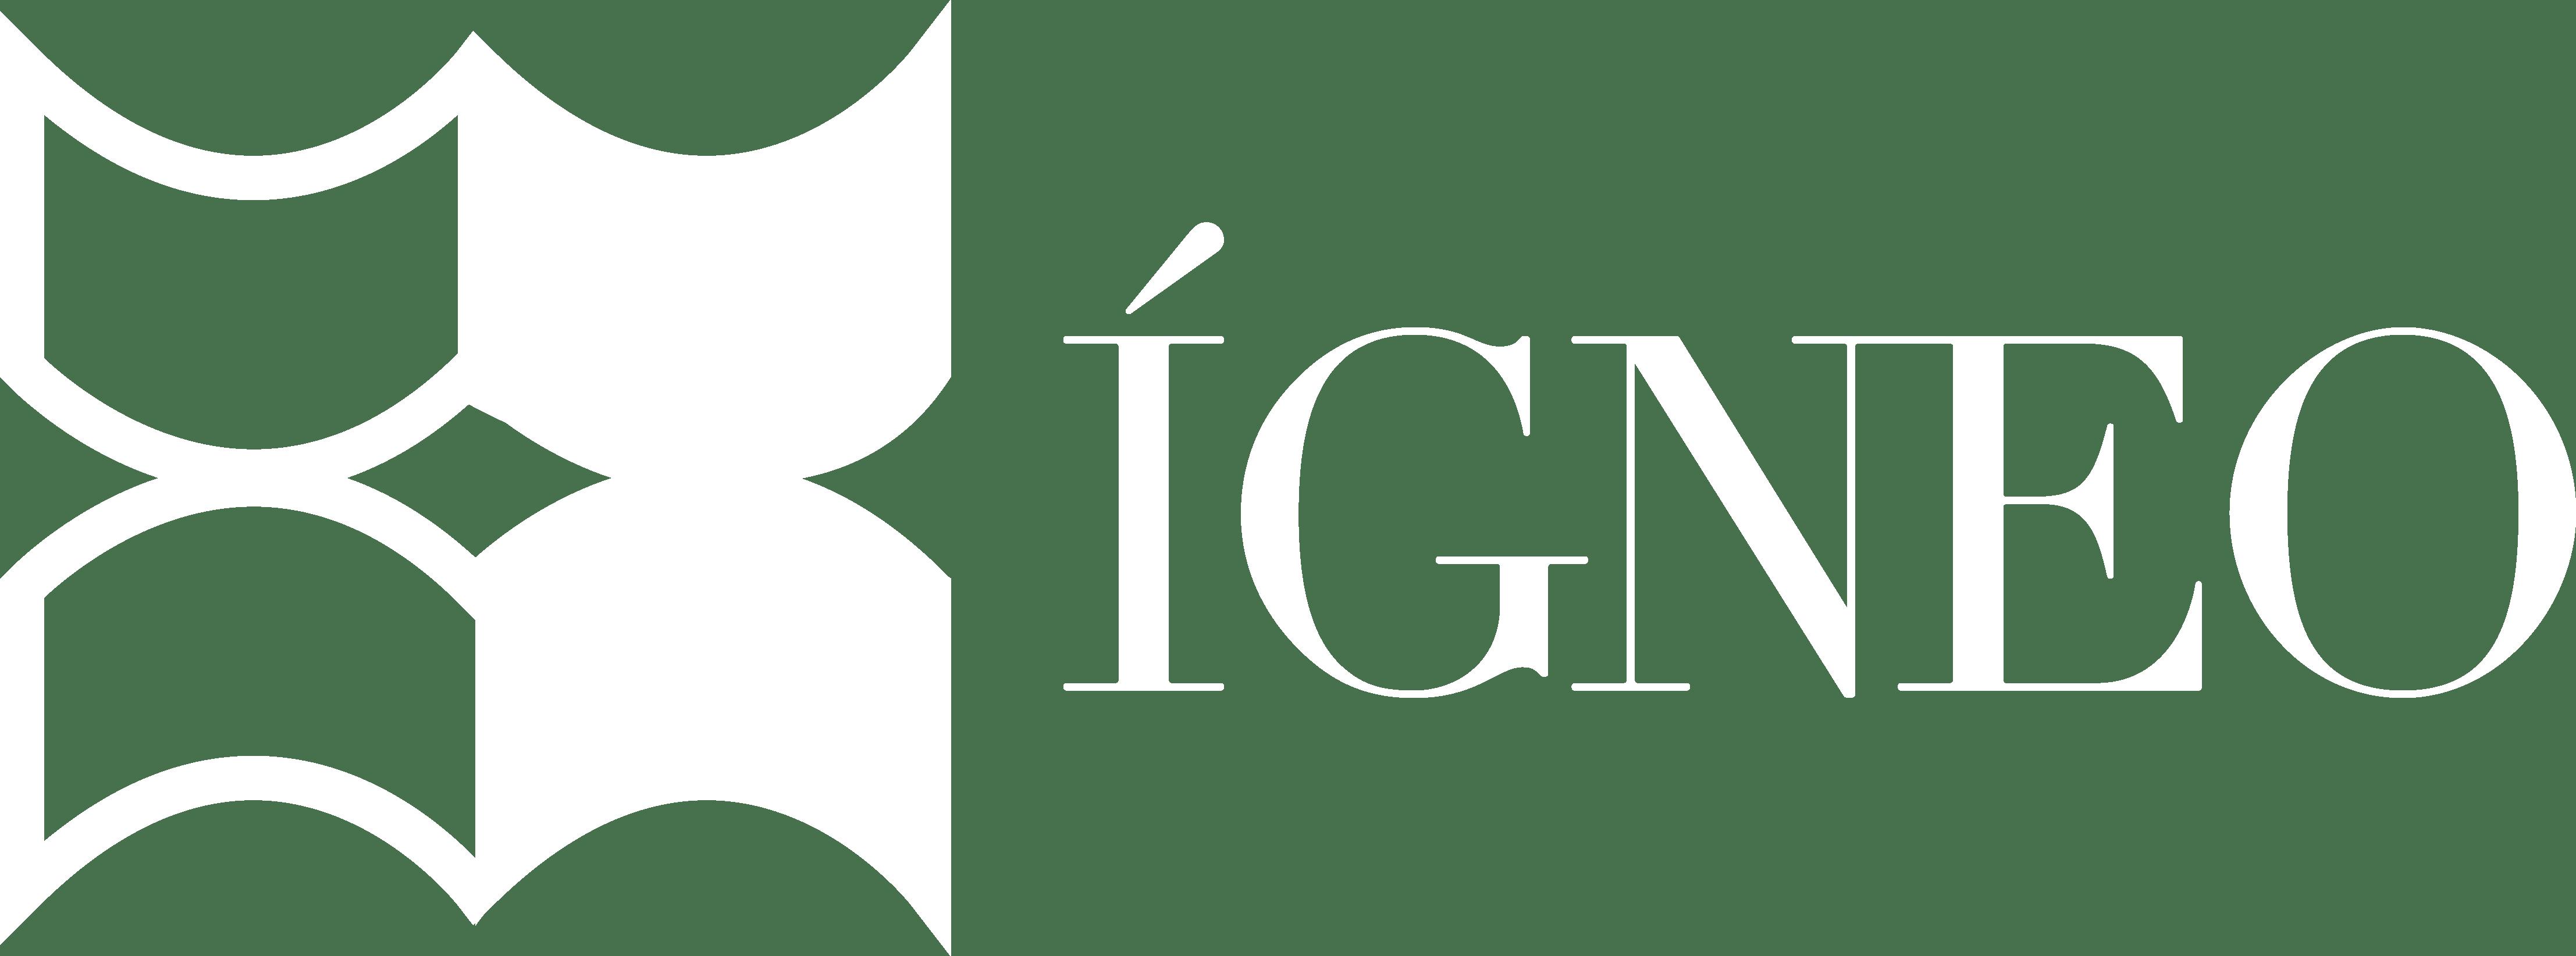 Grupo Ígneo. Editorial Ígneo